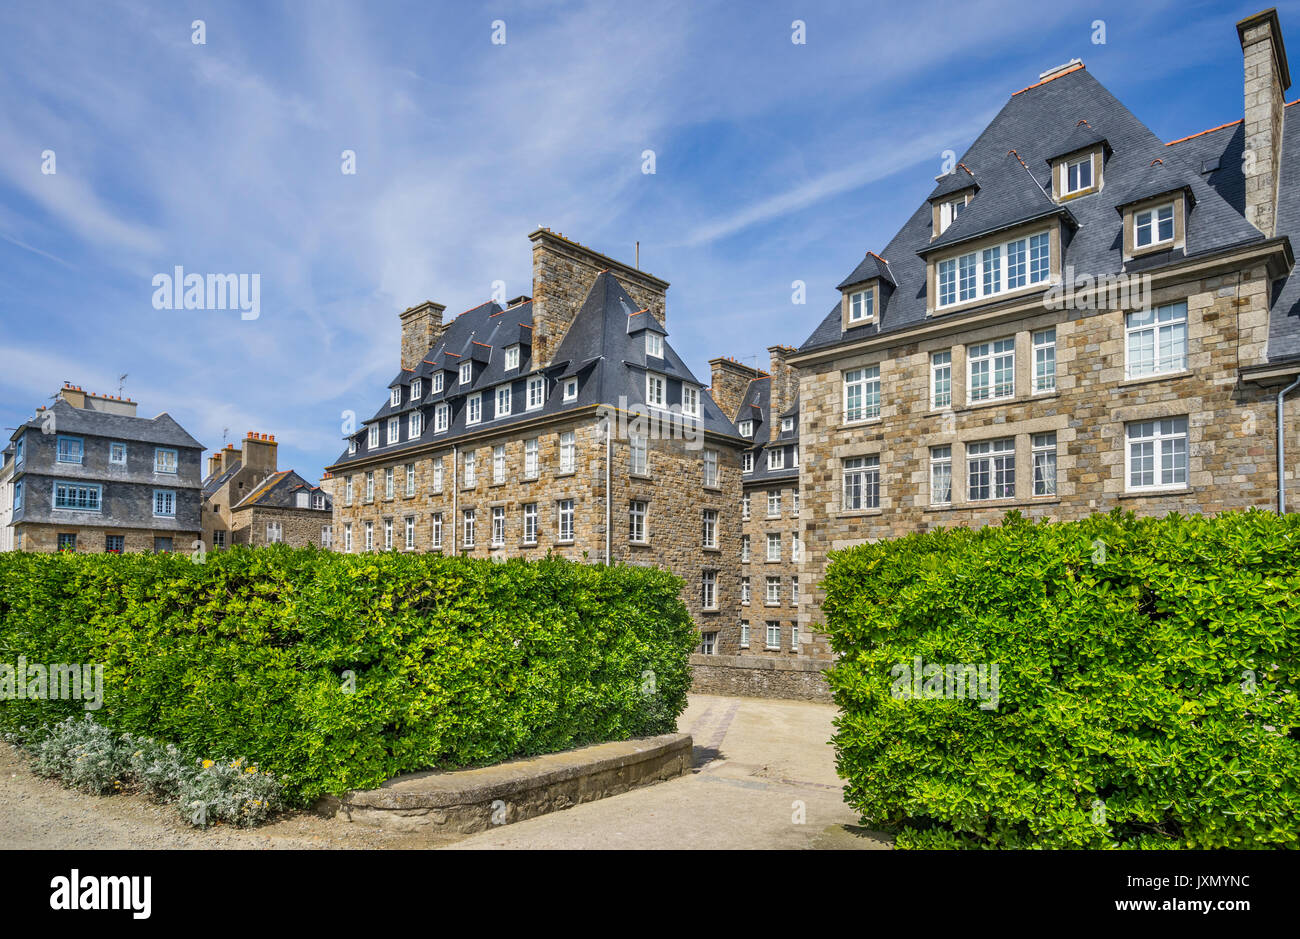 France, Brittany, Saint-Malo, Park at Bastion de la Hollande - Stock Image